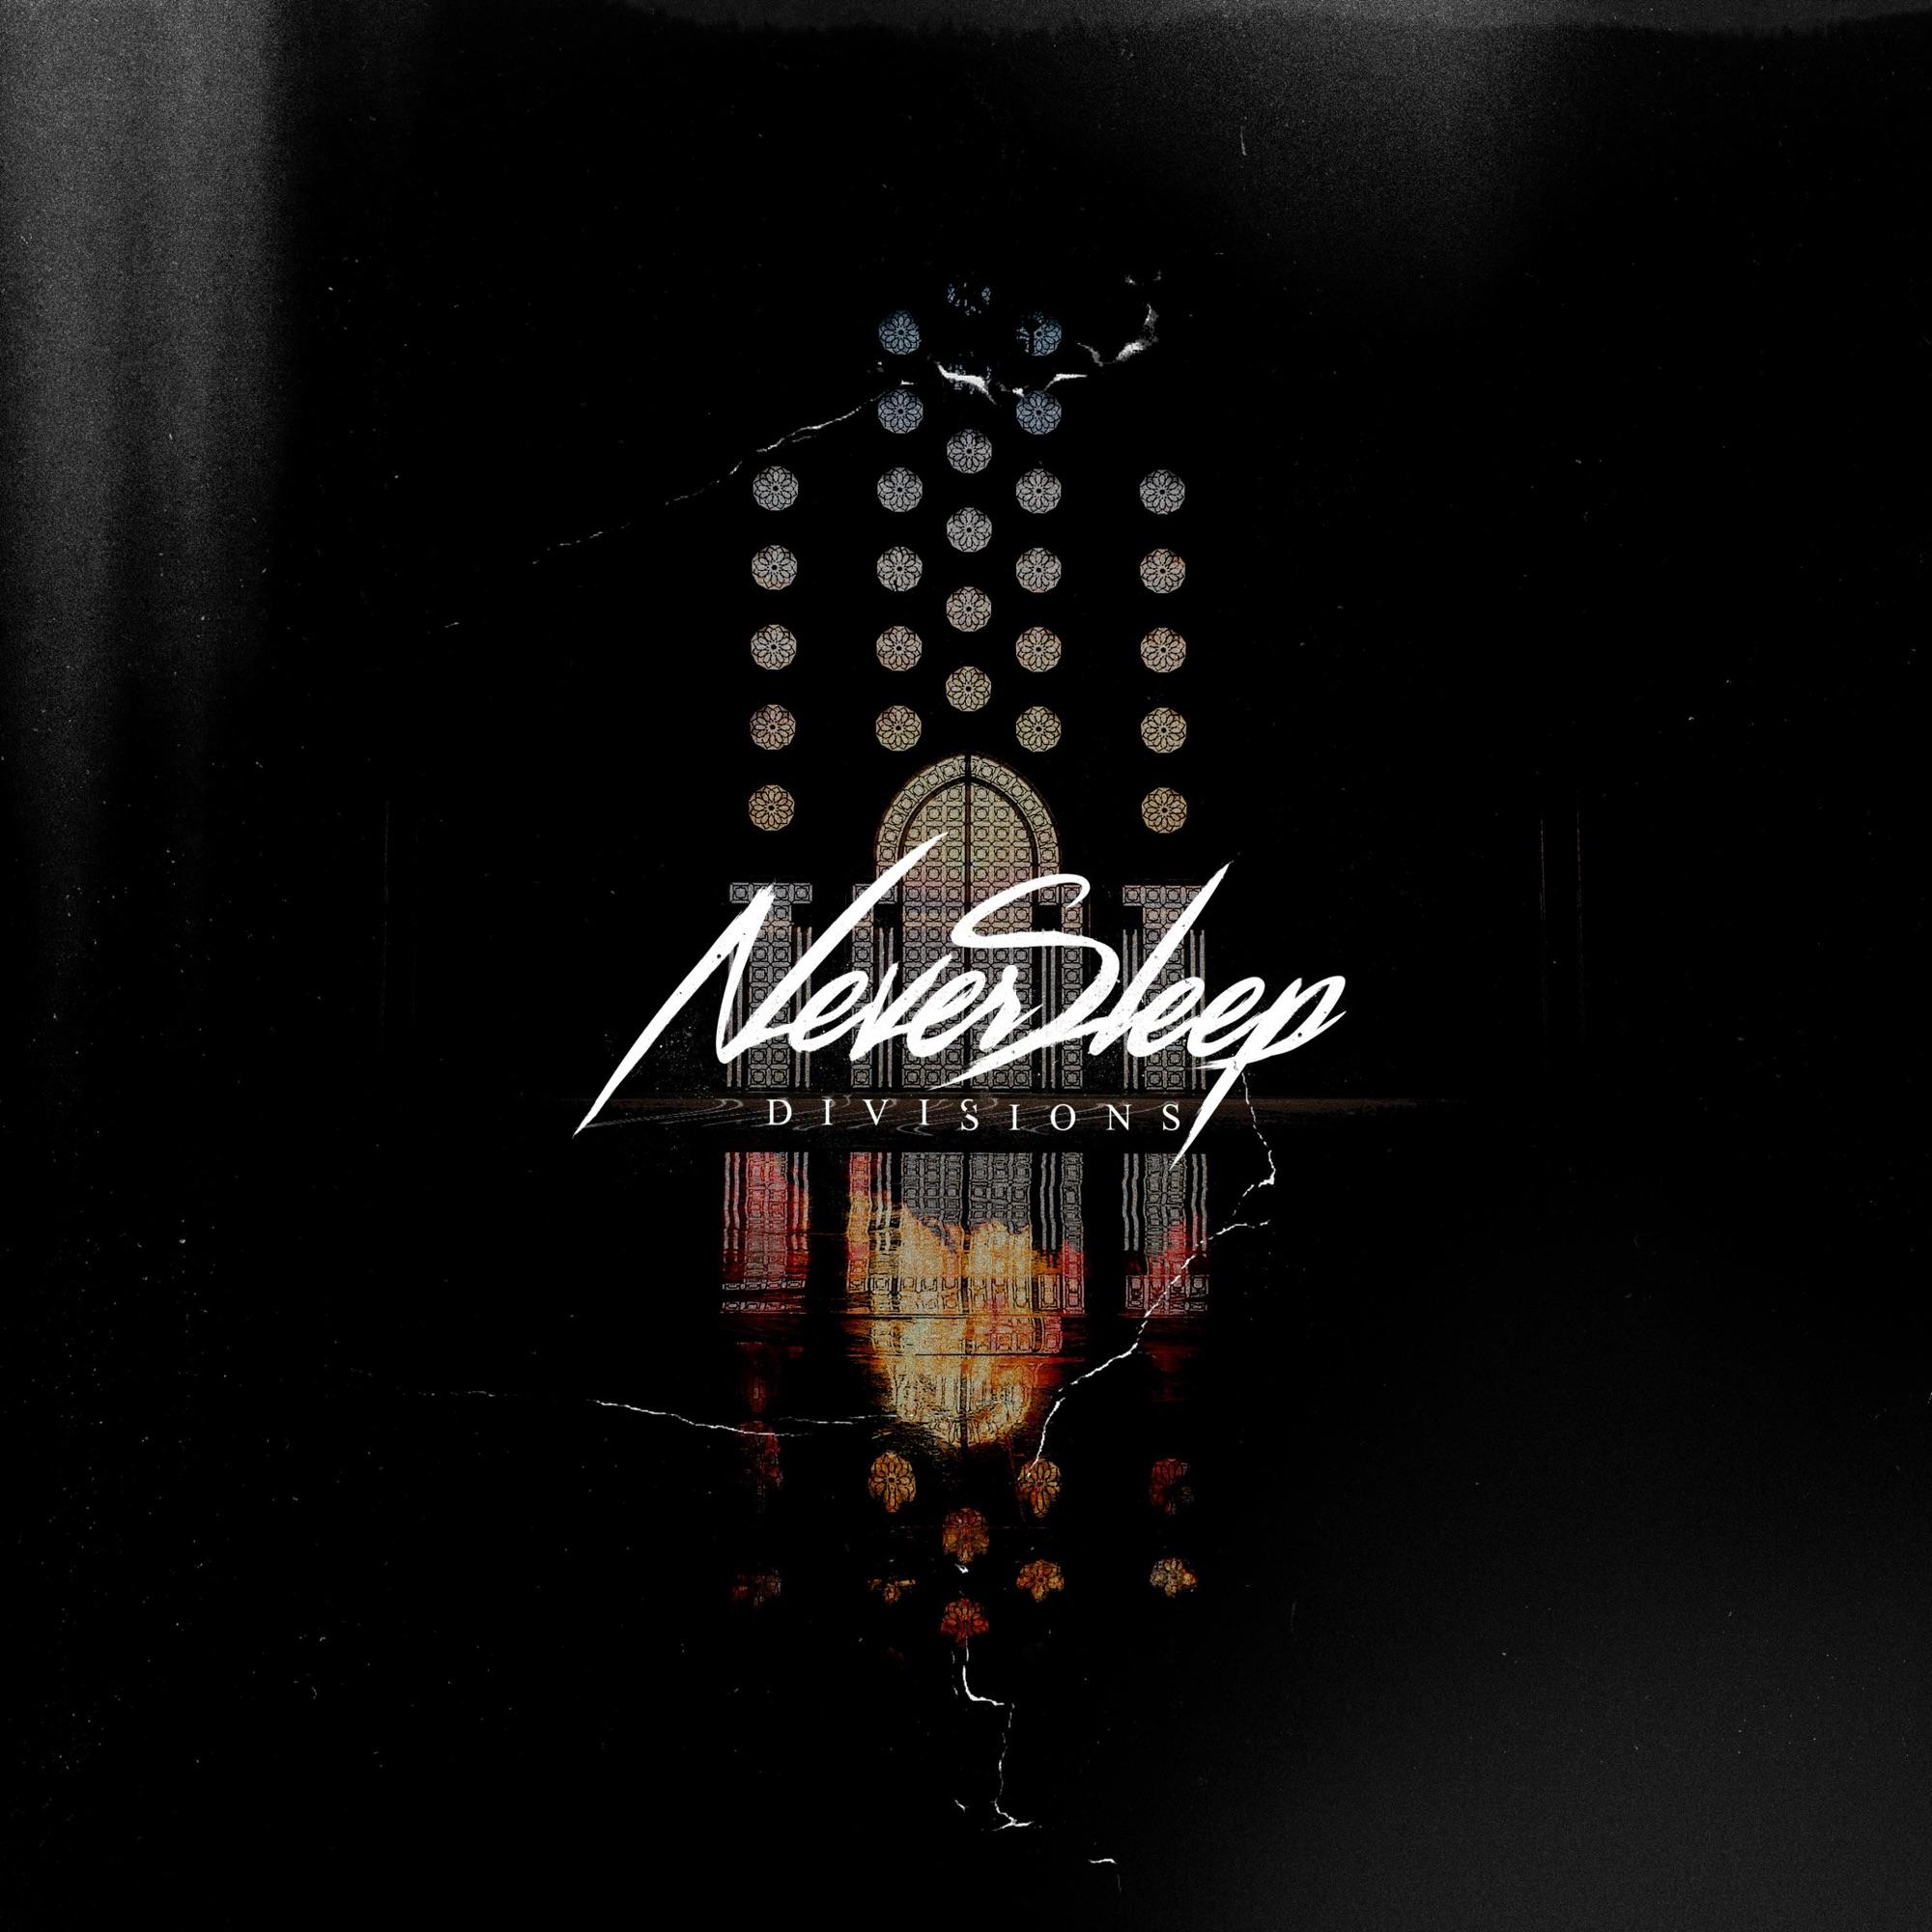 NeverSleep - Divisions [EP] (2019)